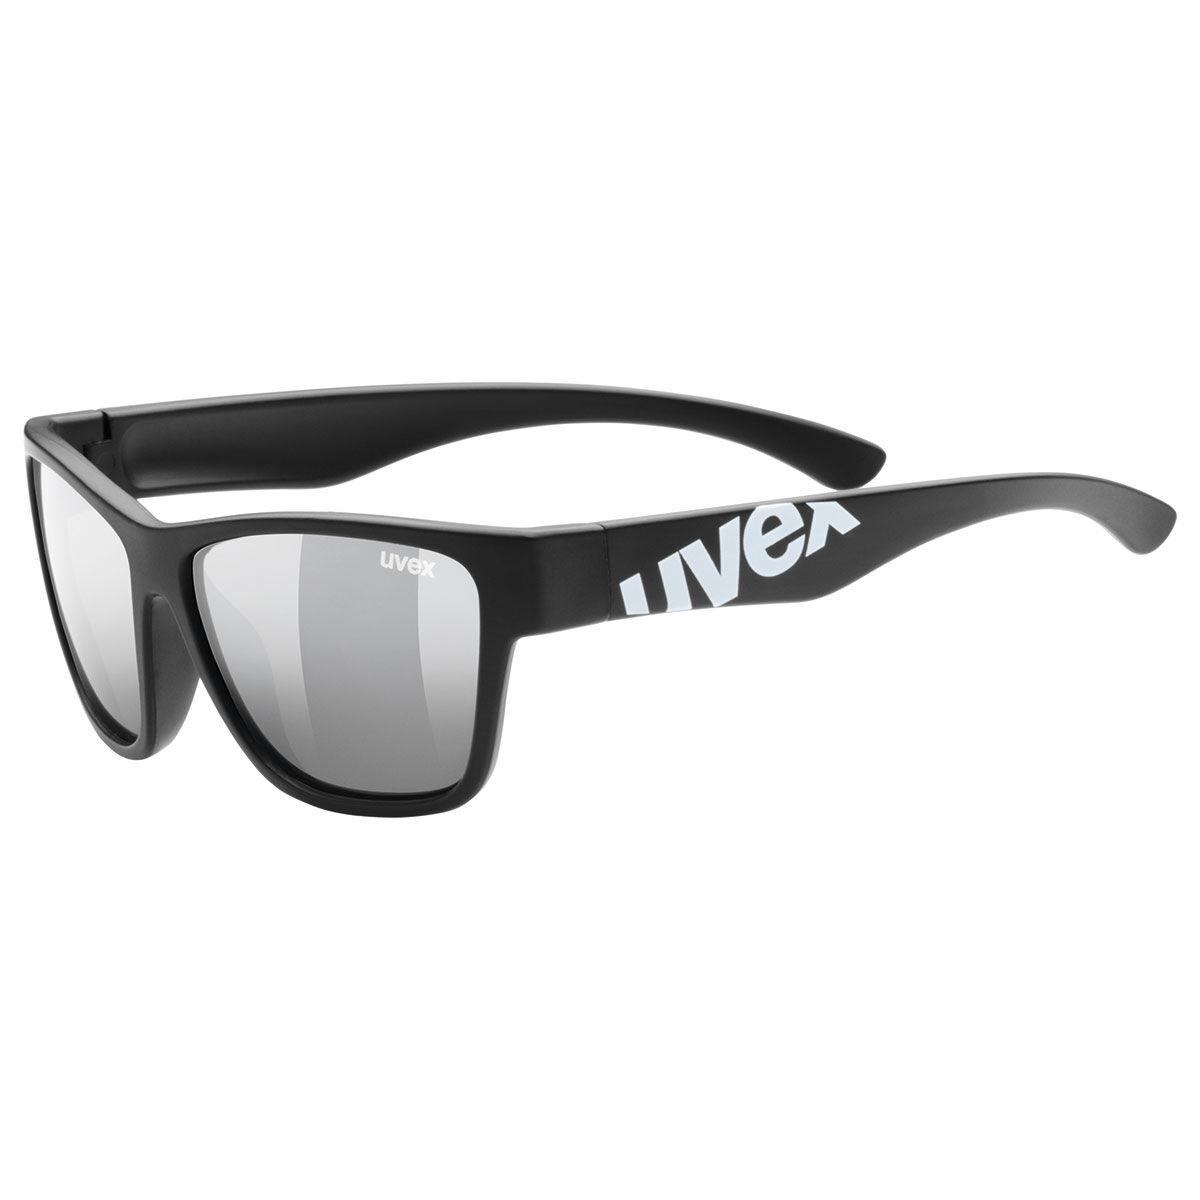 uvex lgl 39 Solglasögon Glasögon Till Ryttaren